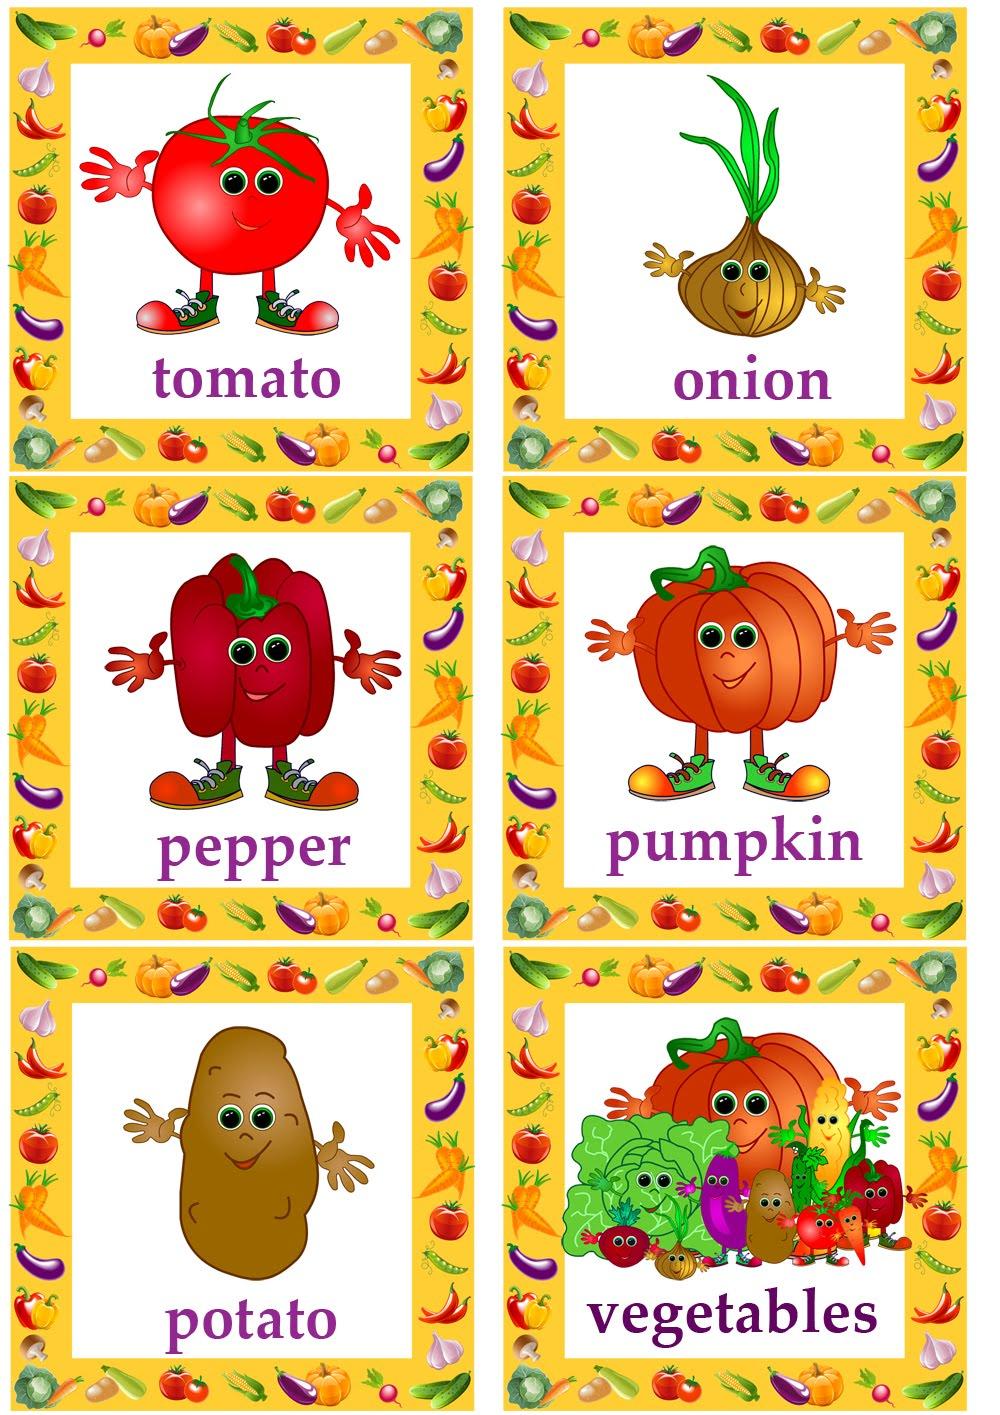 Joyful English For Kids Vegetables Day